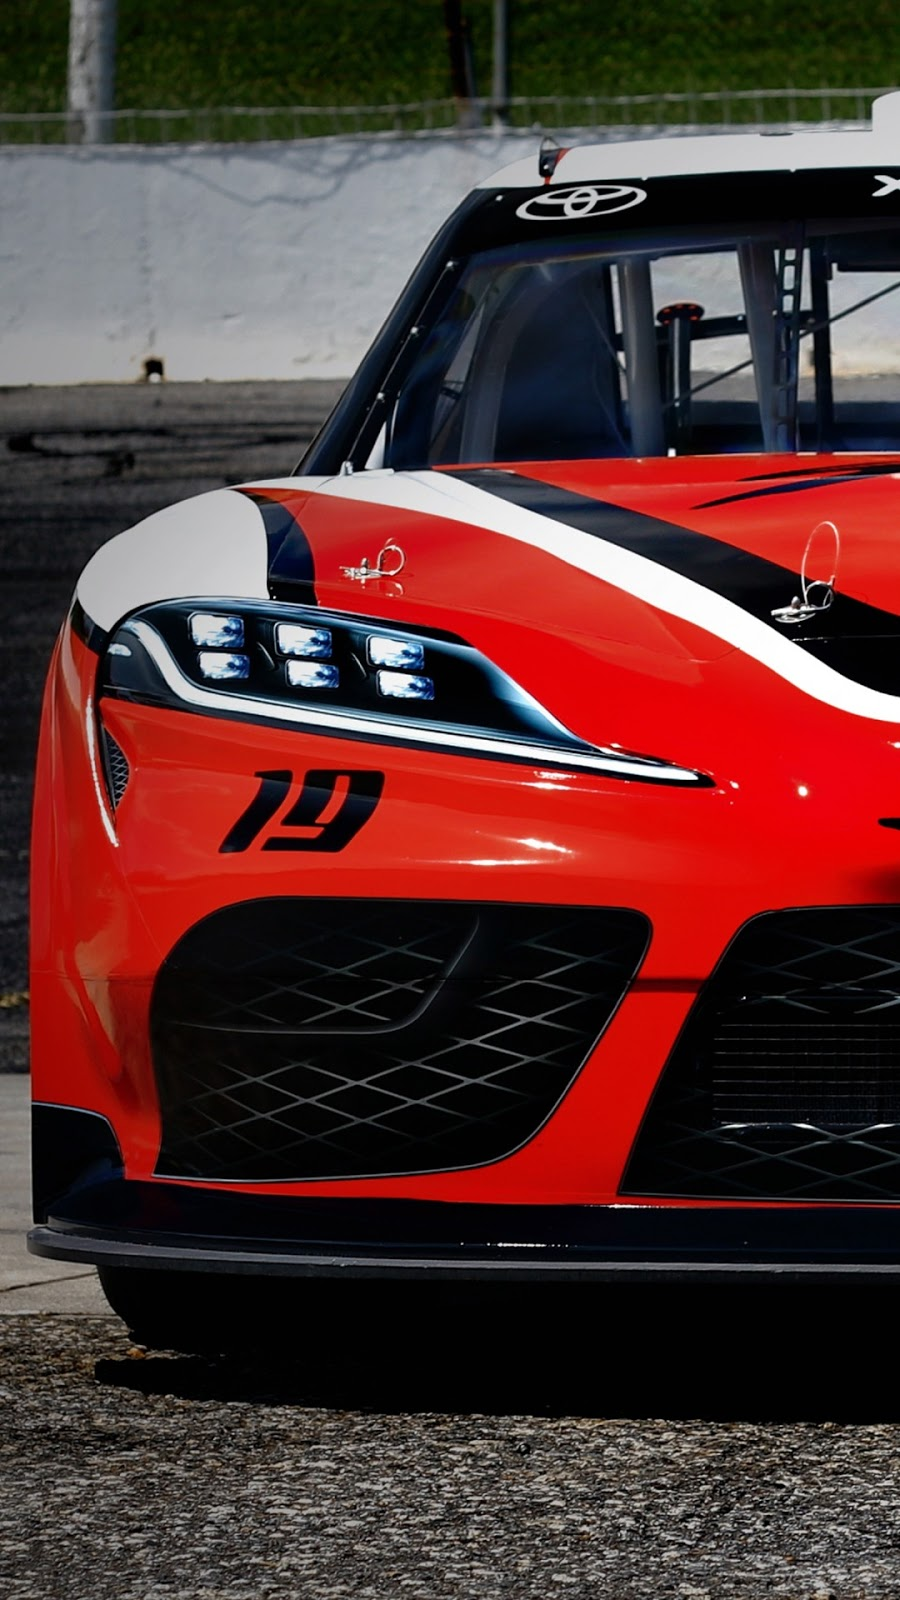 Papel de parede grátis Toyota Supra NASCAR Xfinity Series para PC, Notebook, iPhone, Android e Tablet.